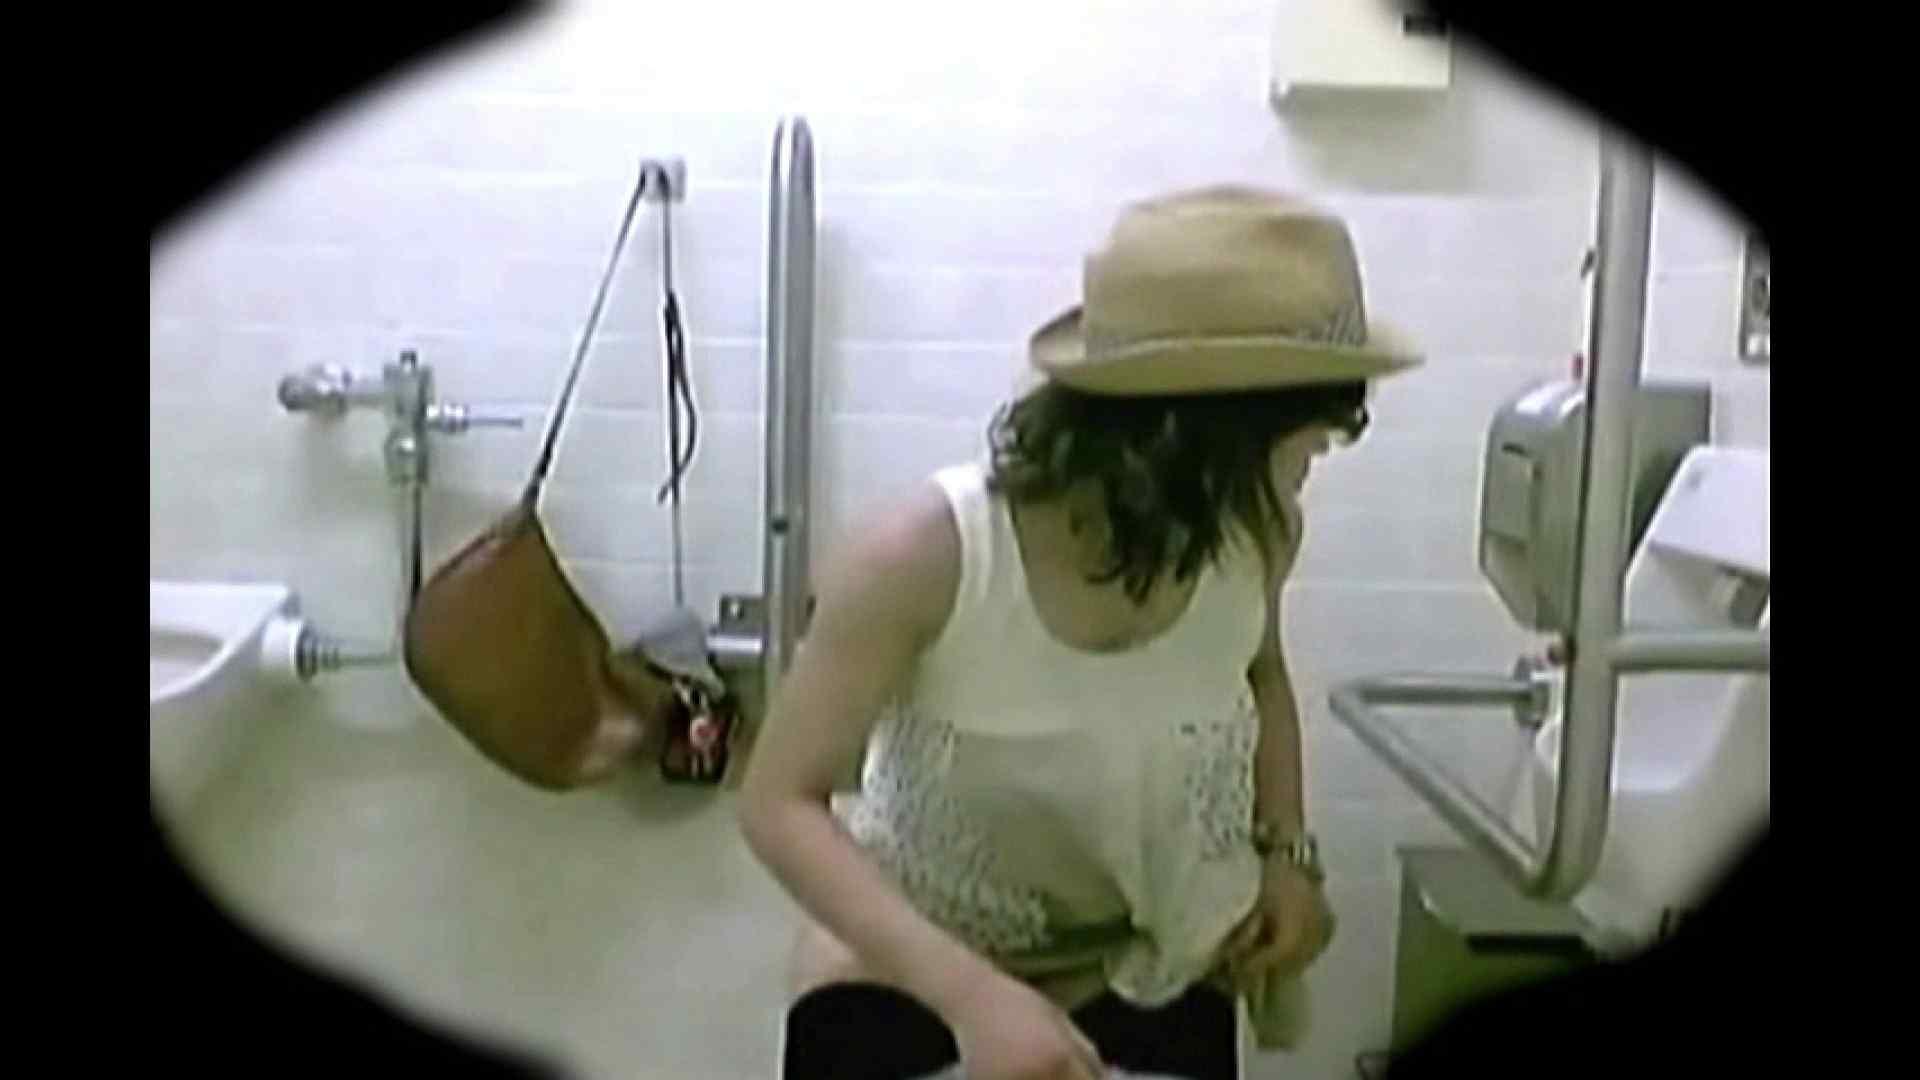 teen galトイレ覗き紙がナイ編‼vol.06 OLのエロ生活  82連発 68